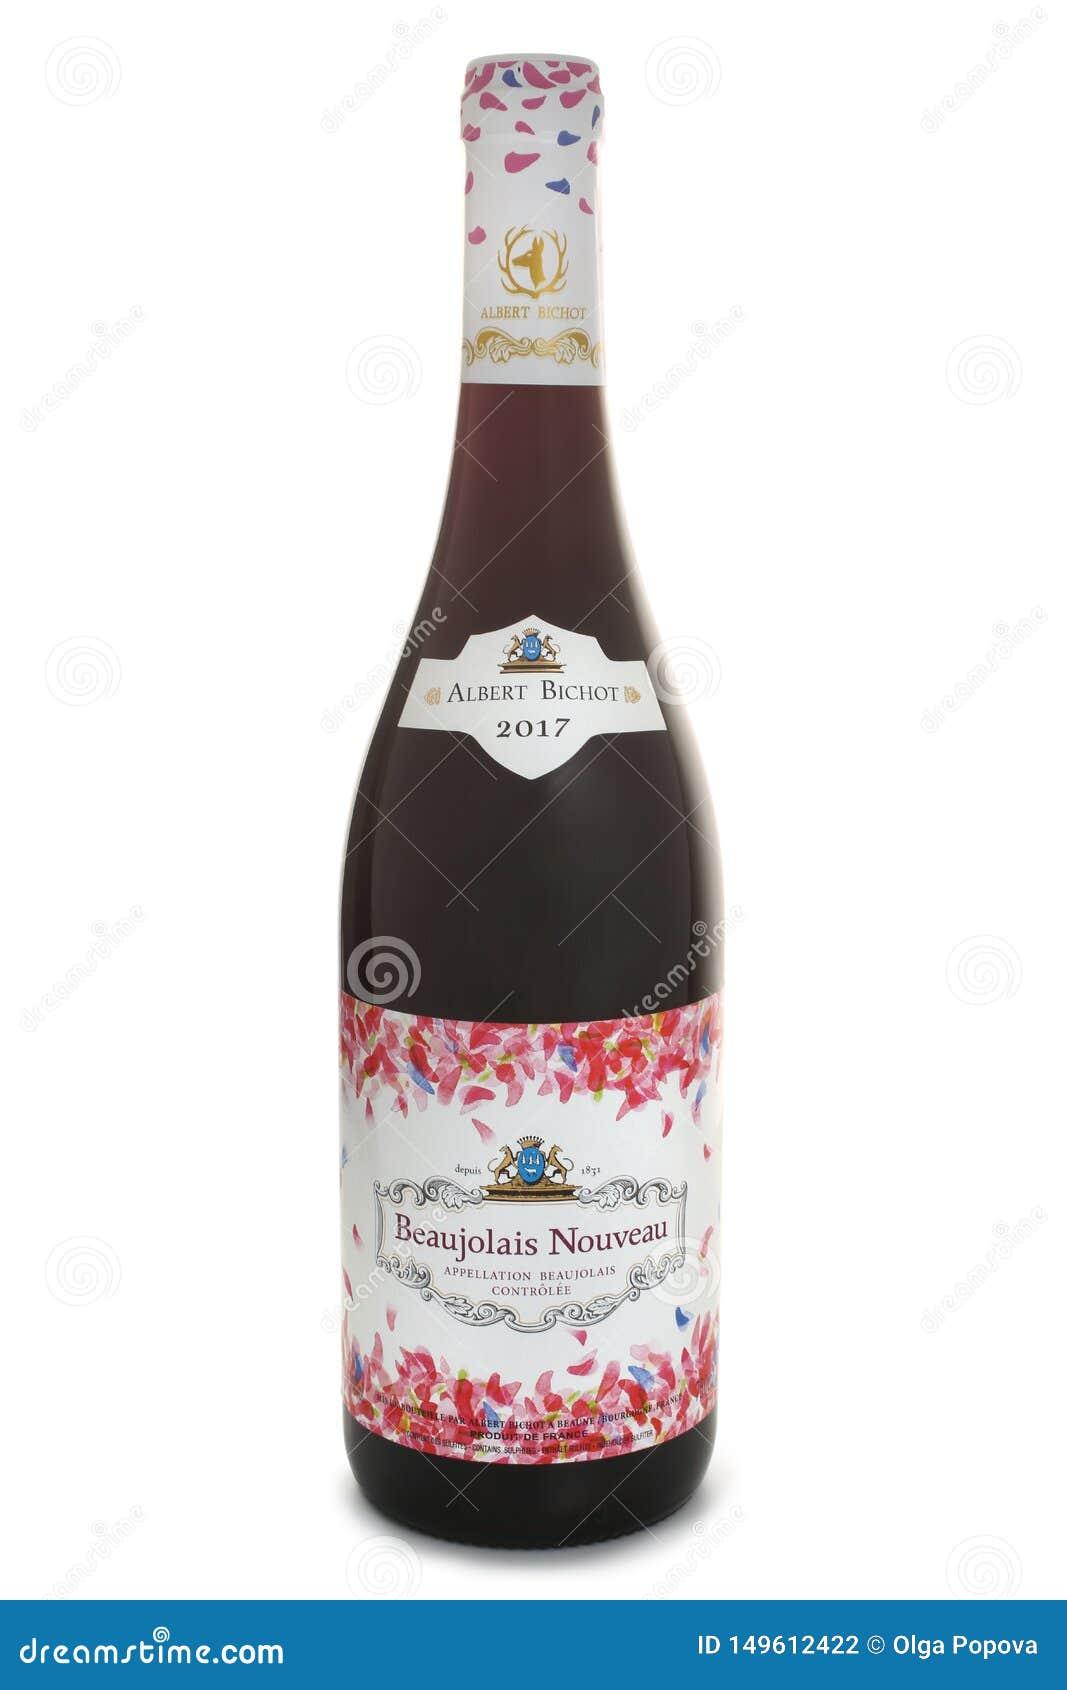 ST ΠΕΤΡΟΥΠΟΛΗ, ΡΩΣΙΑ - 19 ΝΟΕΜΒΡΊΟΥ 2017: Μπουκάλι Αλβέρτου Bichot Beaujolais Nouveau, Burgundy, Γαλλία, 2017